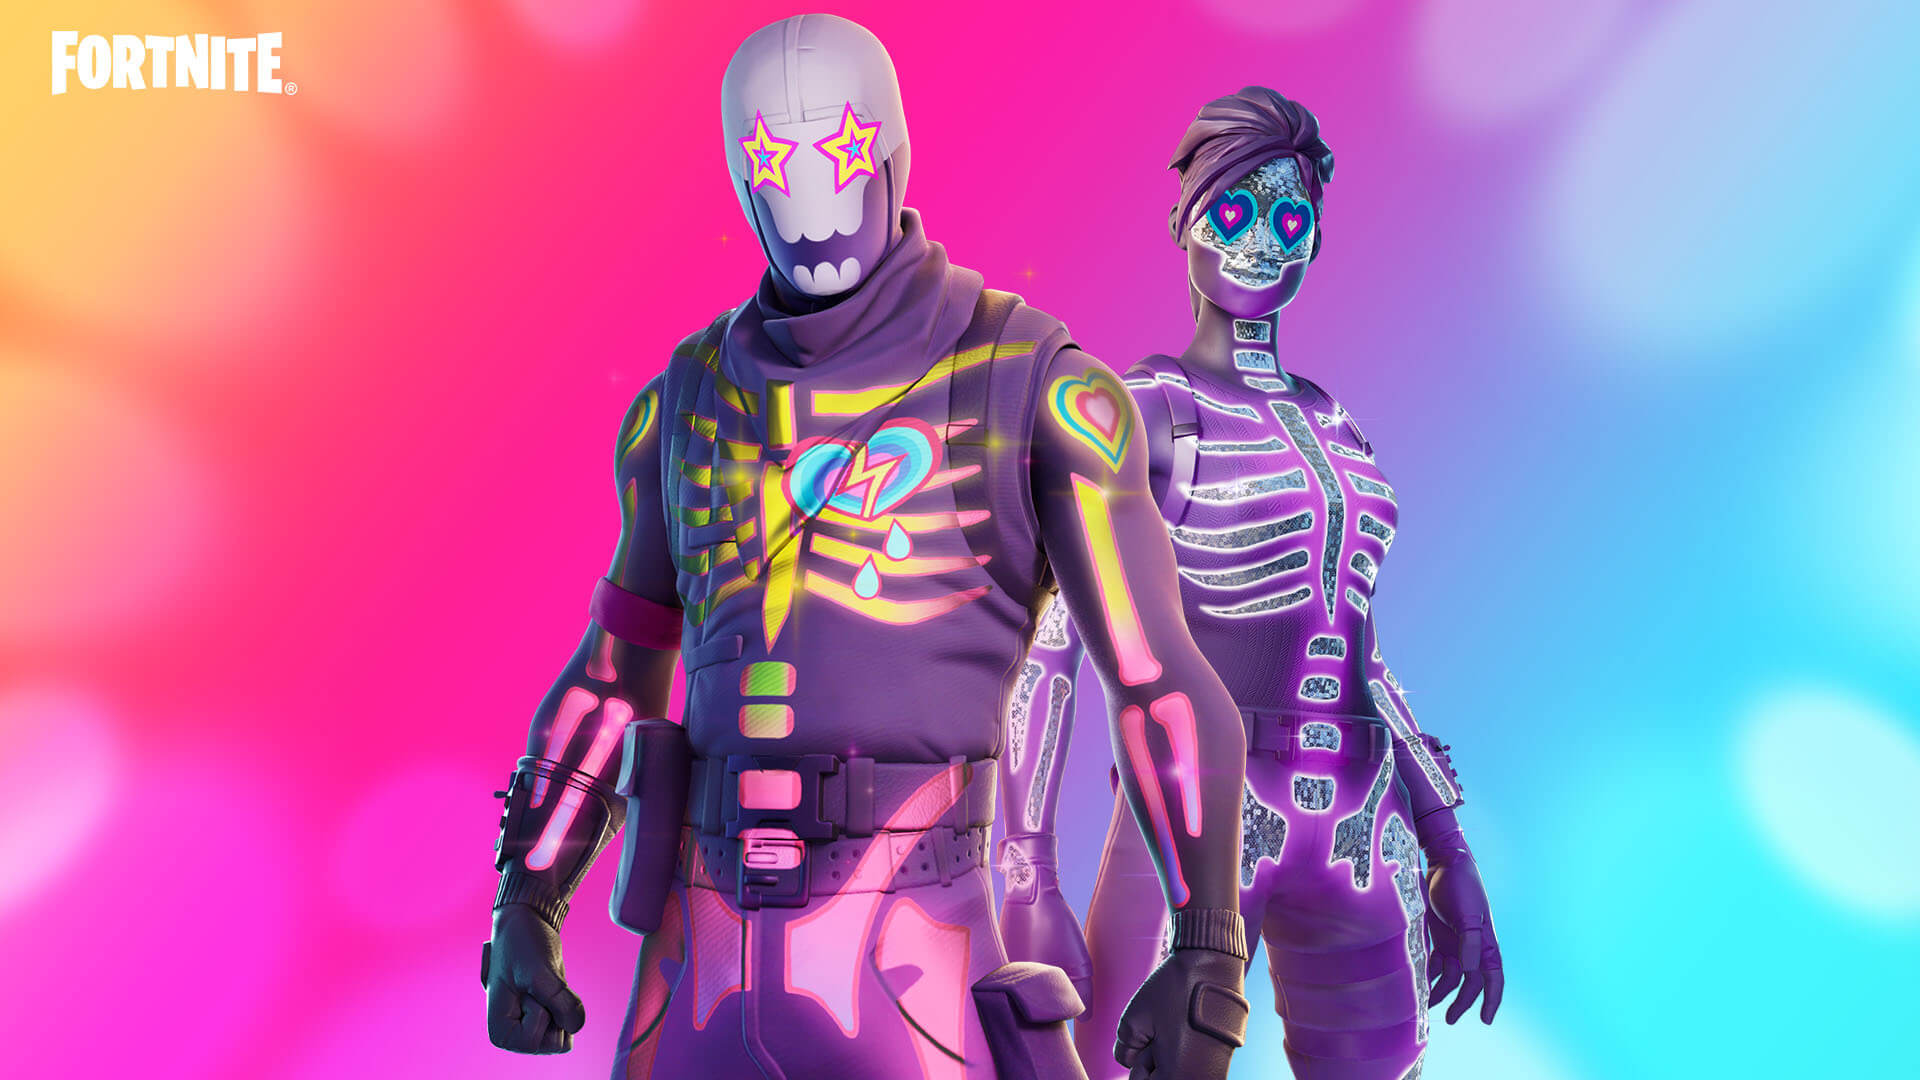 Fortnite Sparkle Skull And Party Trooper Variants